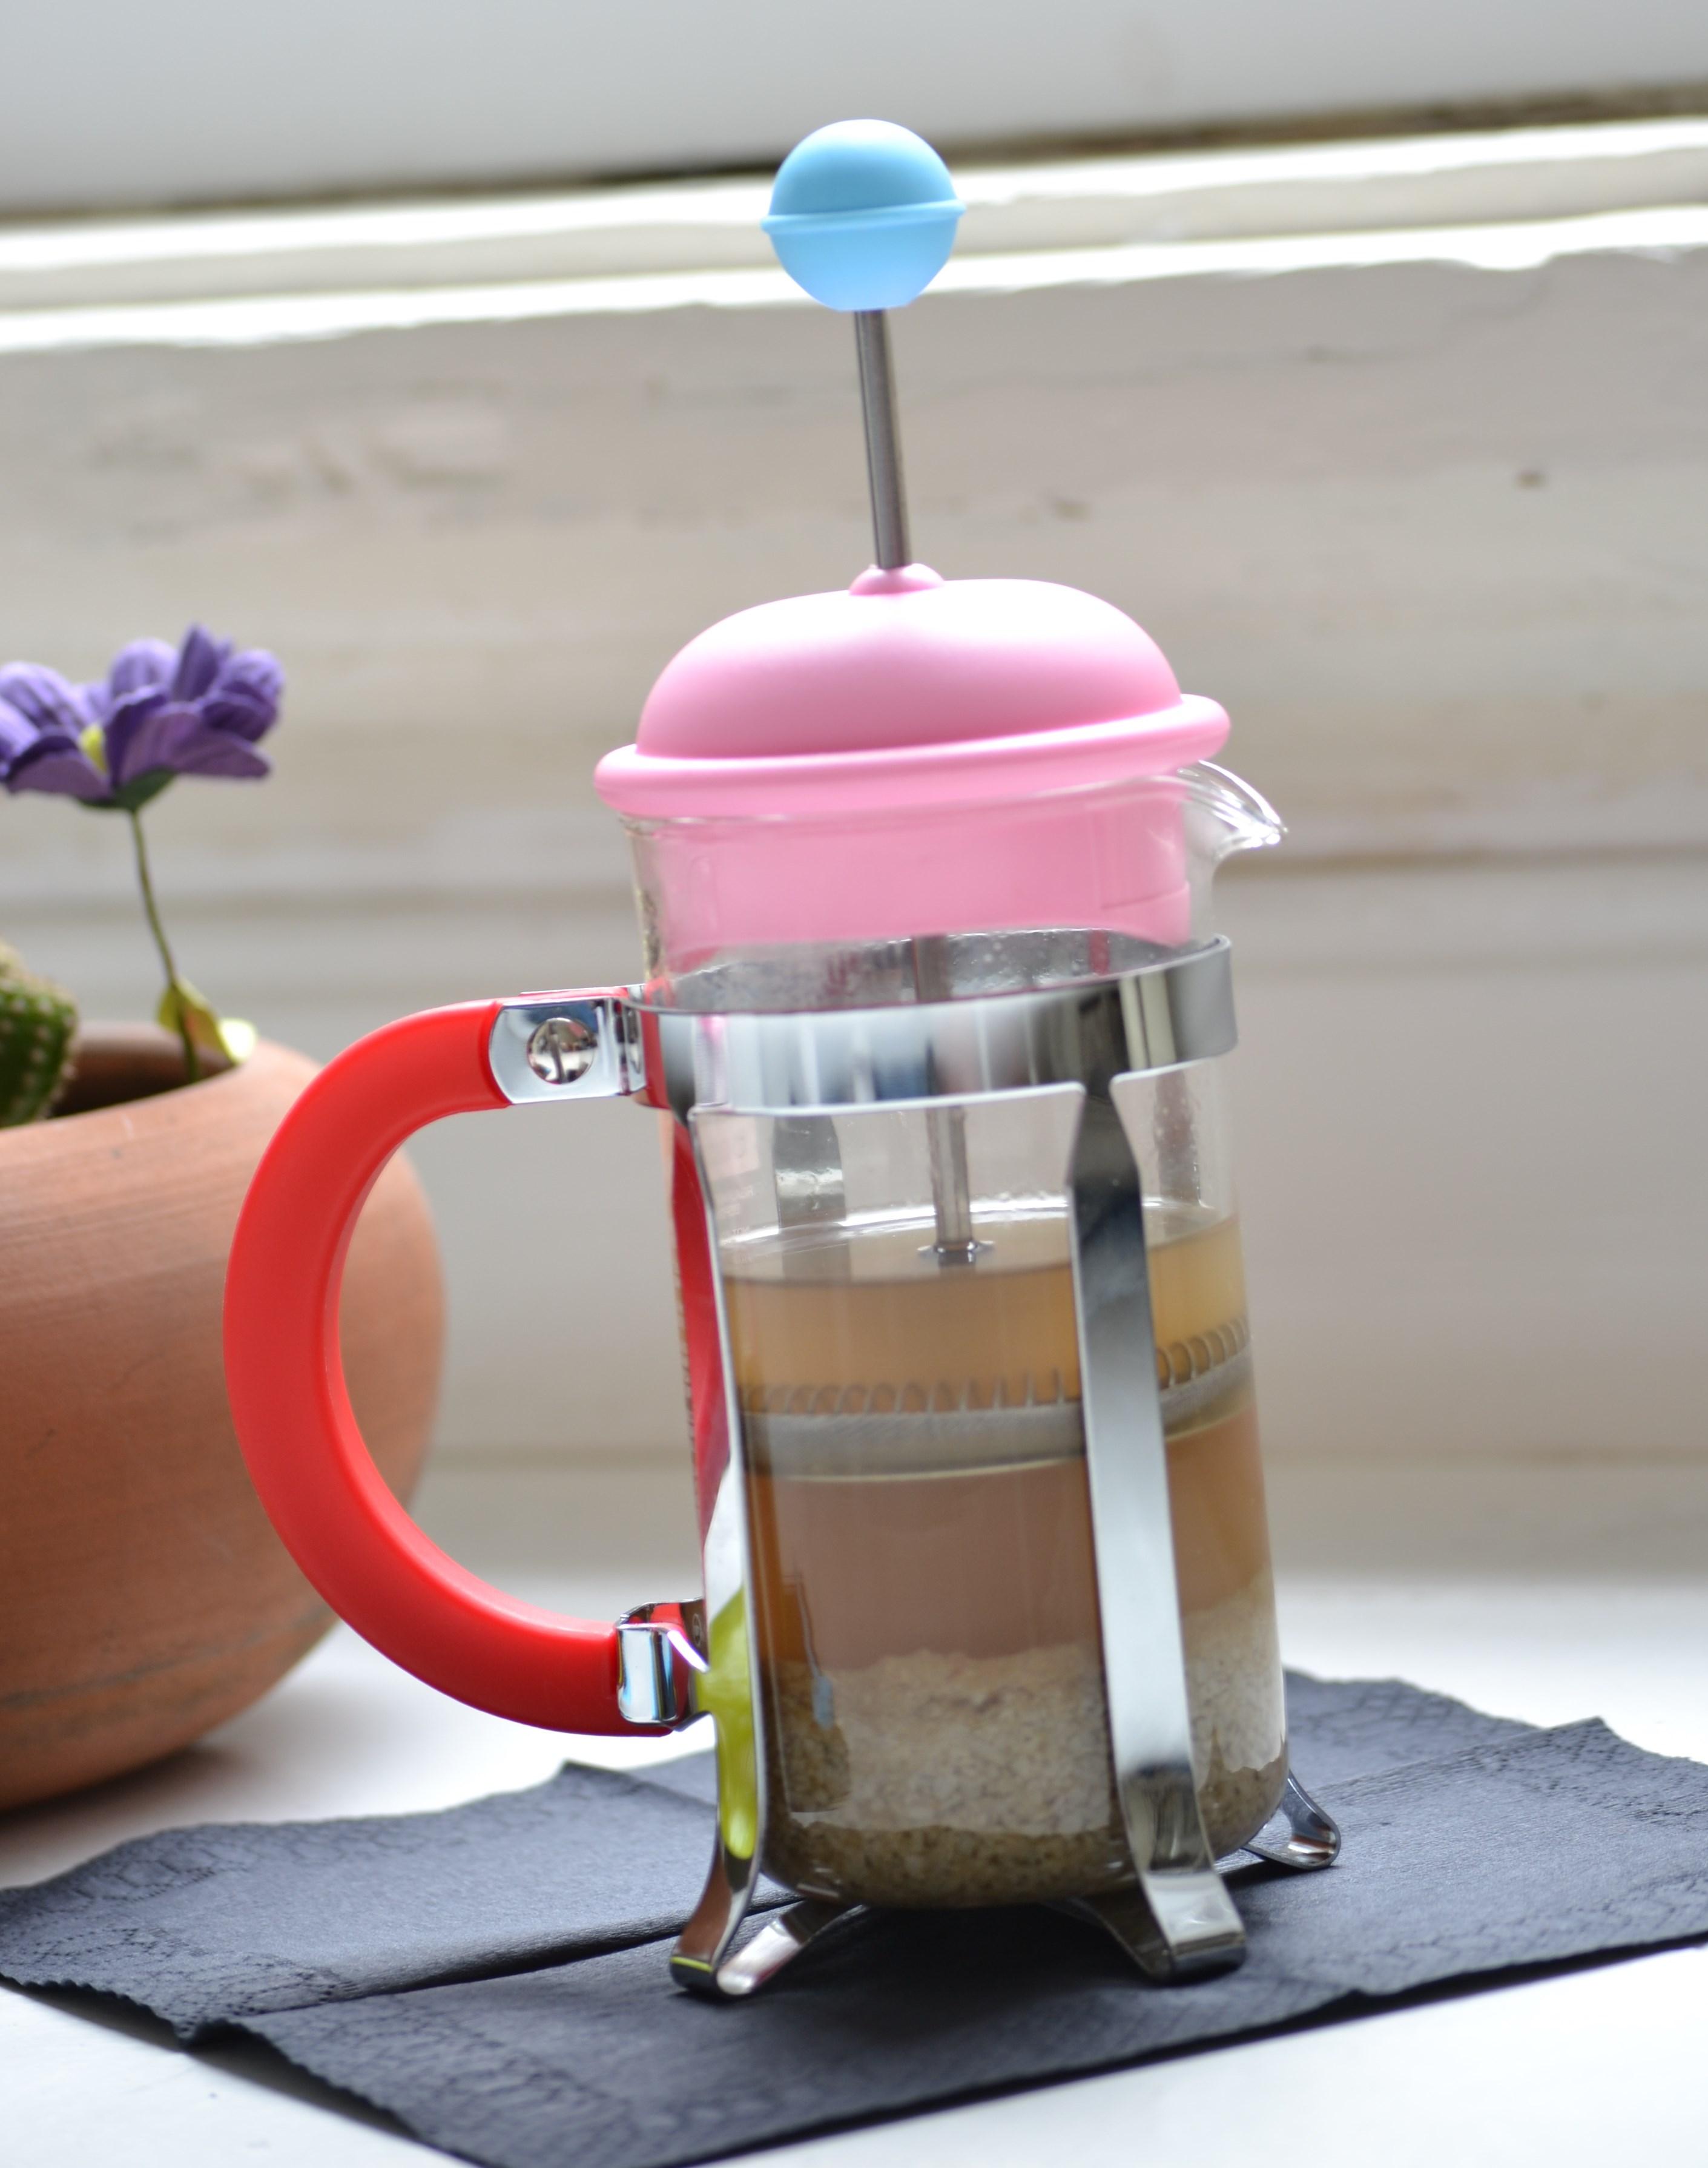 Cafe_Verde_Jenjibre_Anticelulitico_Healthy_Lara_Martin_Gilarranz_Bymyheels (3)